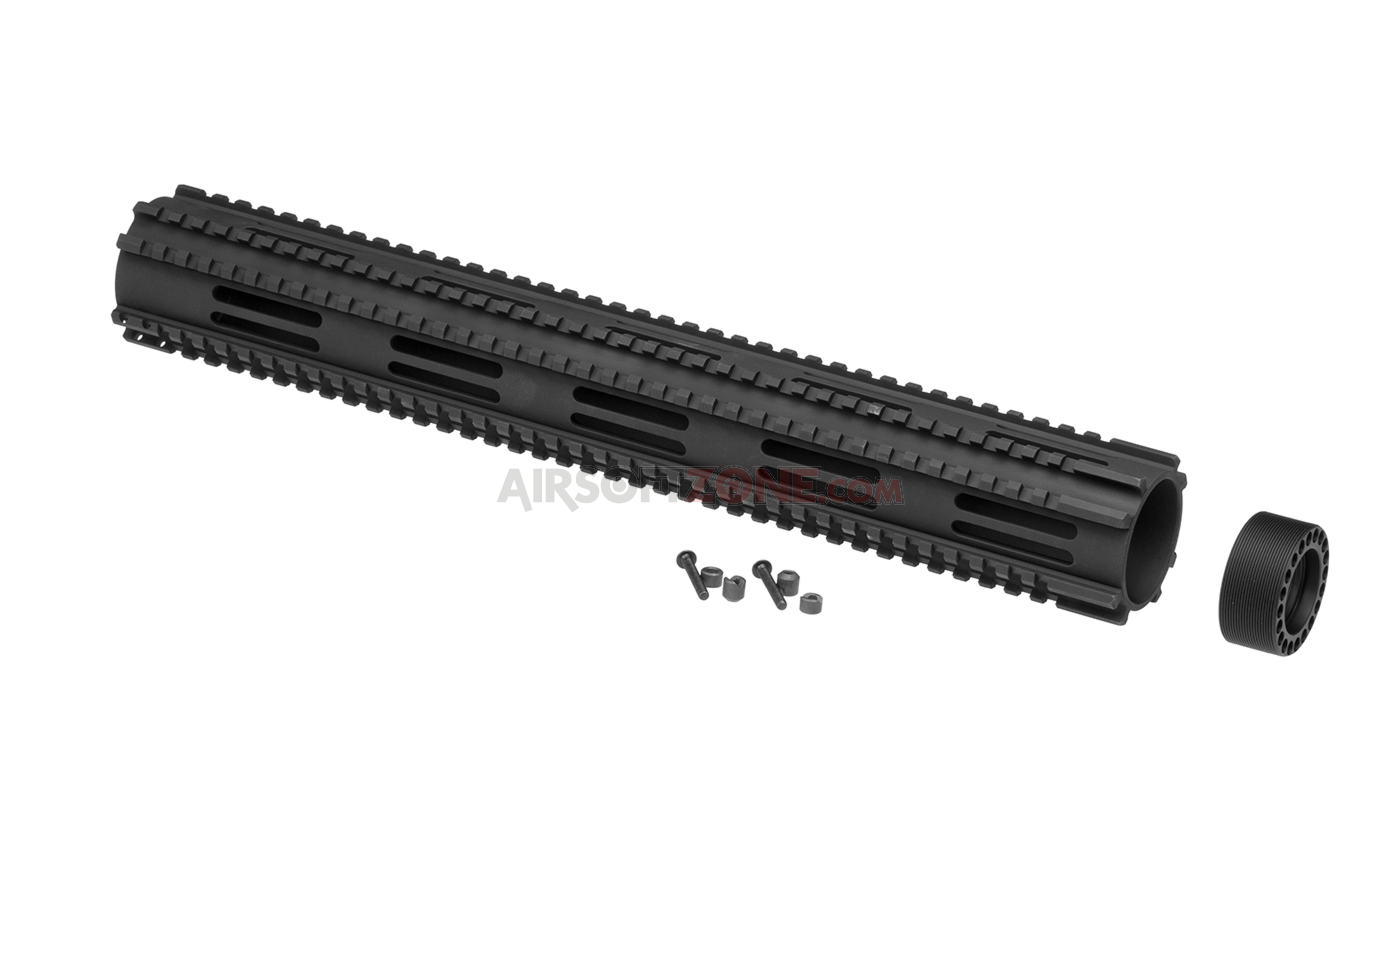 Dragon Fire CNC Handguard 16 25 Inch